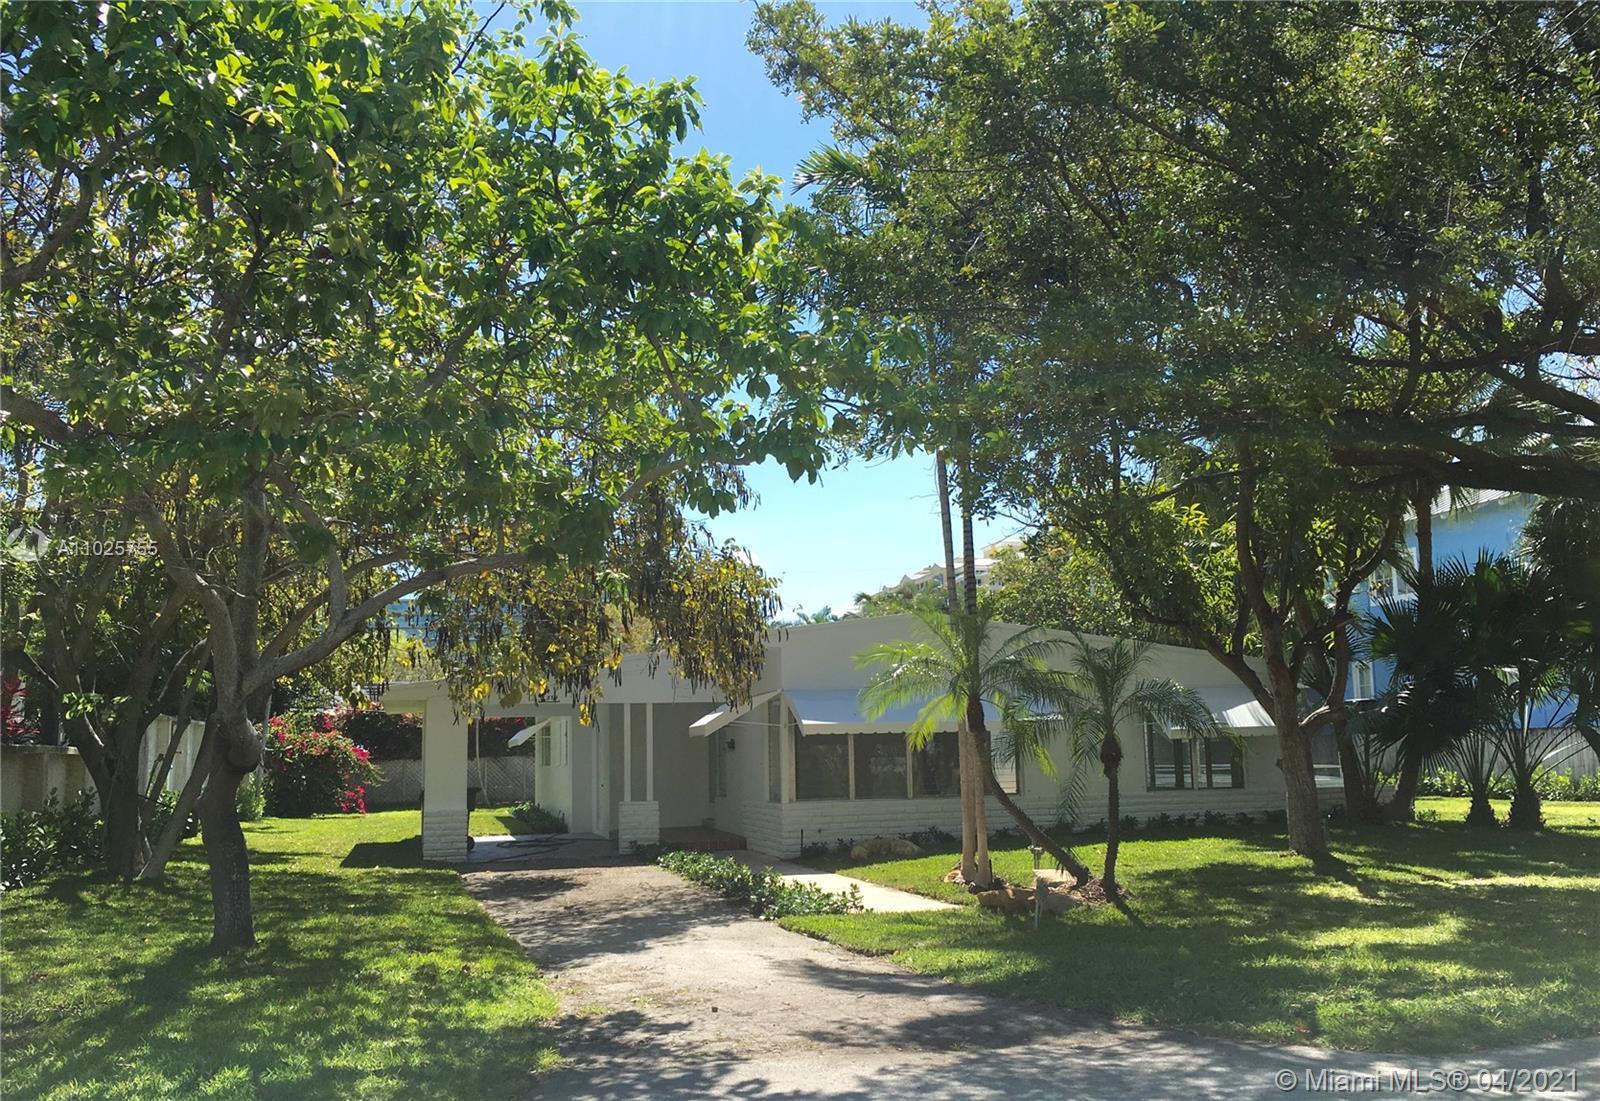 Holiday Colony - 379 Gulf Rd, Key Biscayne, FL 33149